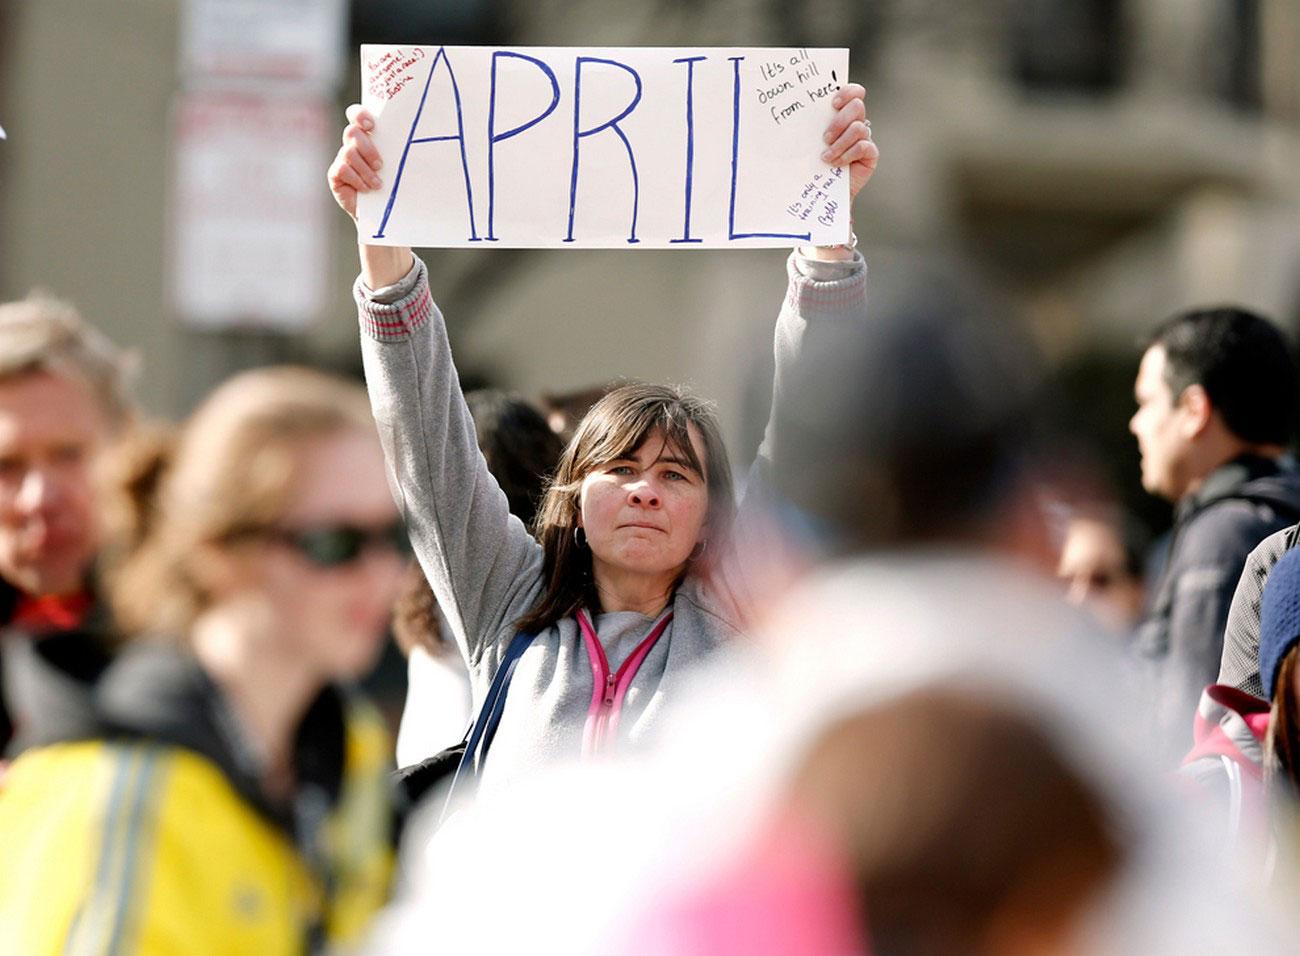 женщина в поисках друга на площади Копли